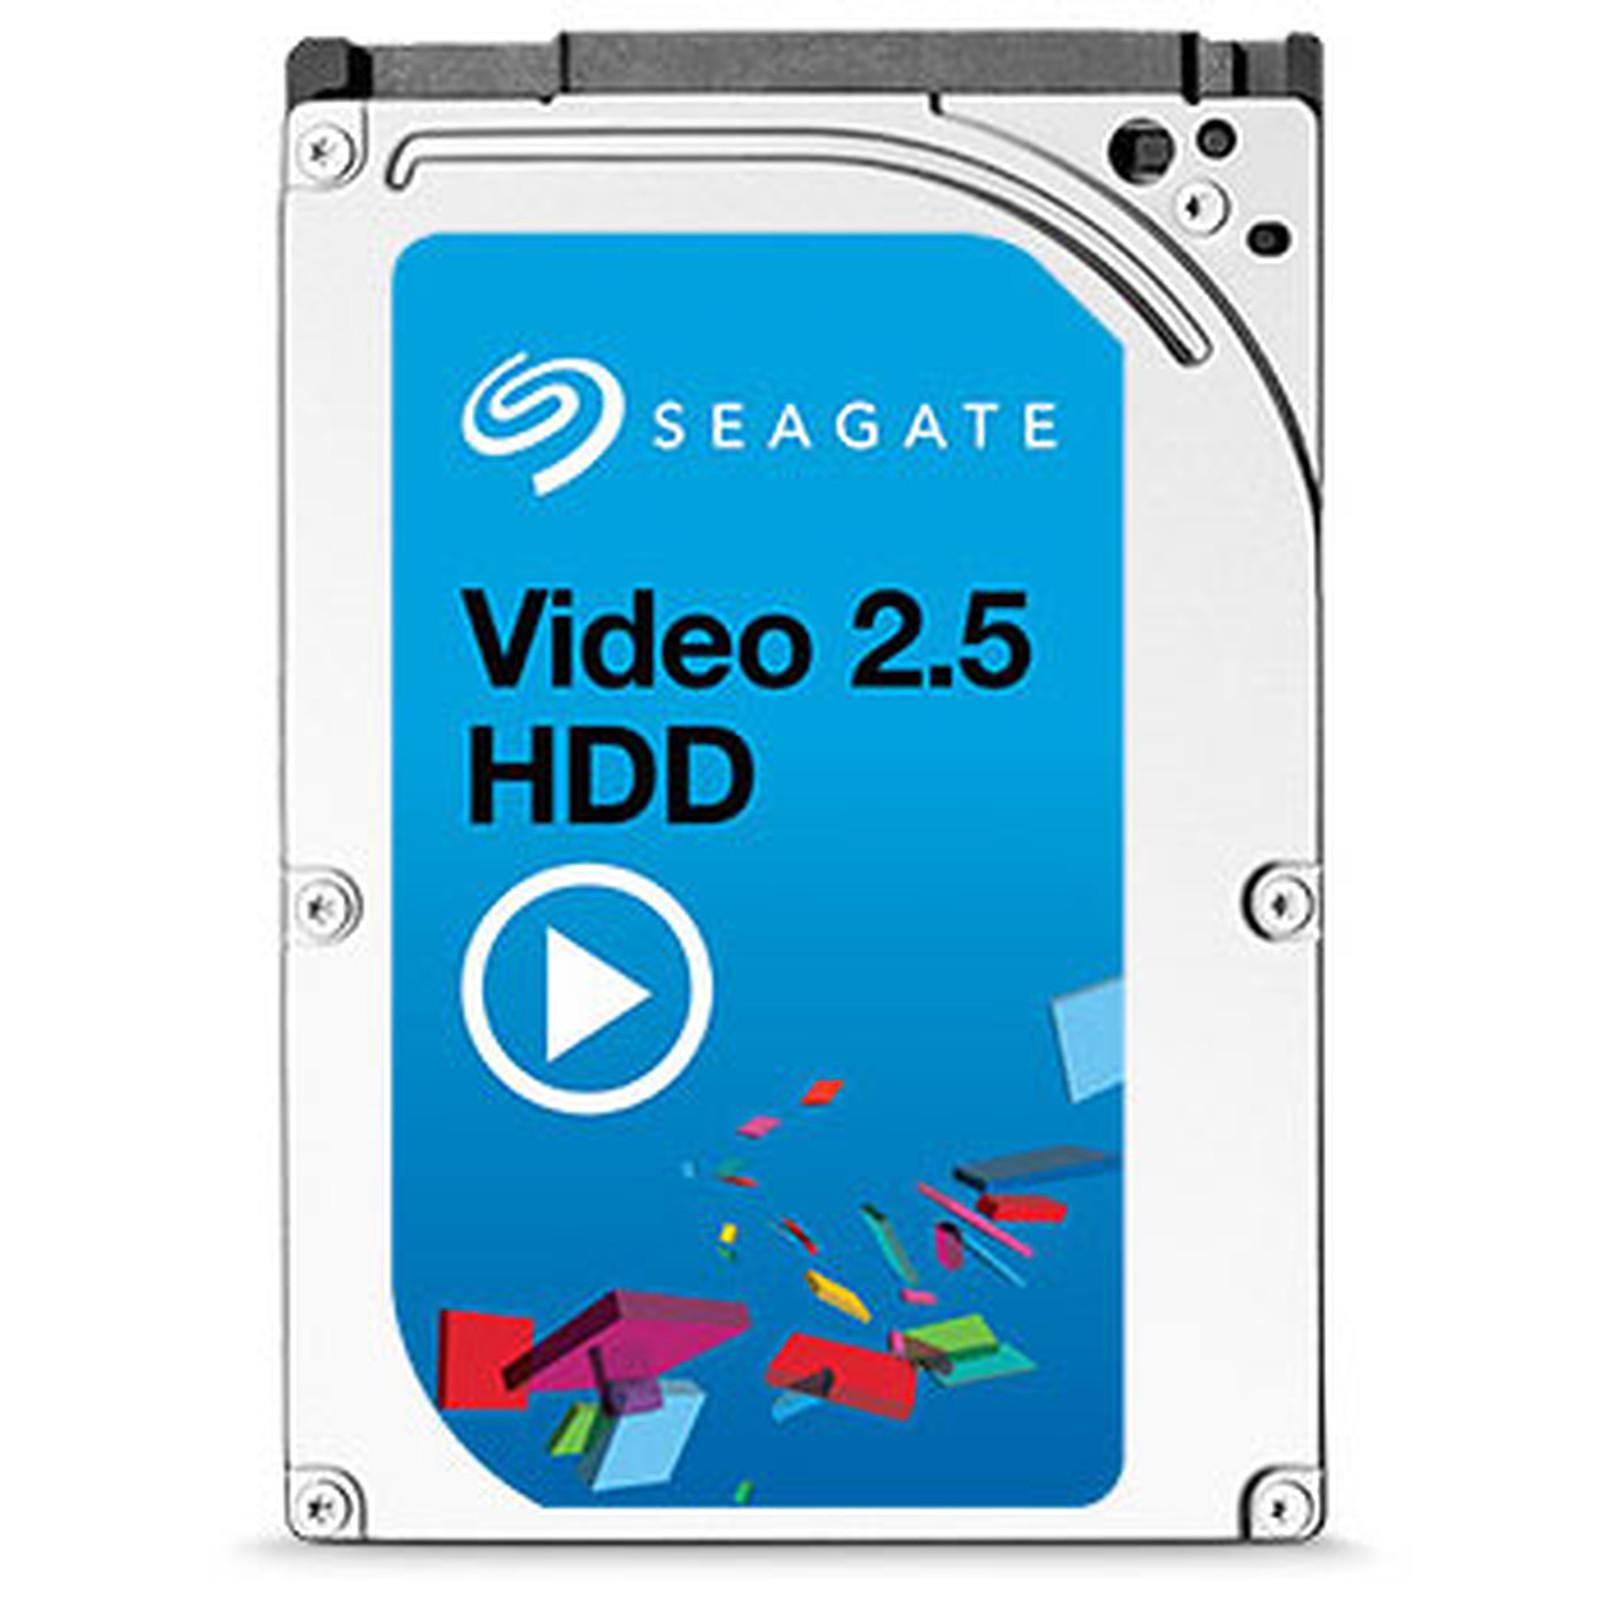 Seagate Video 2.5 HDD 500 Go